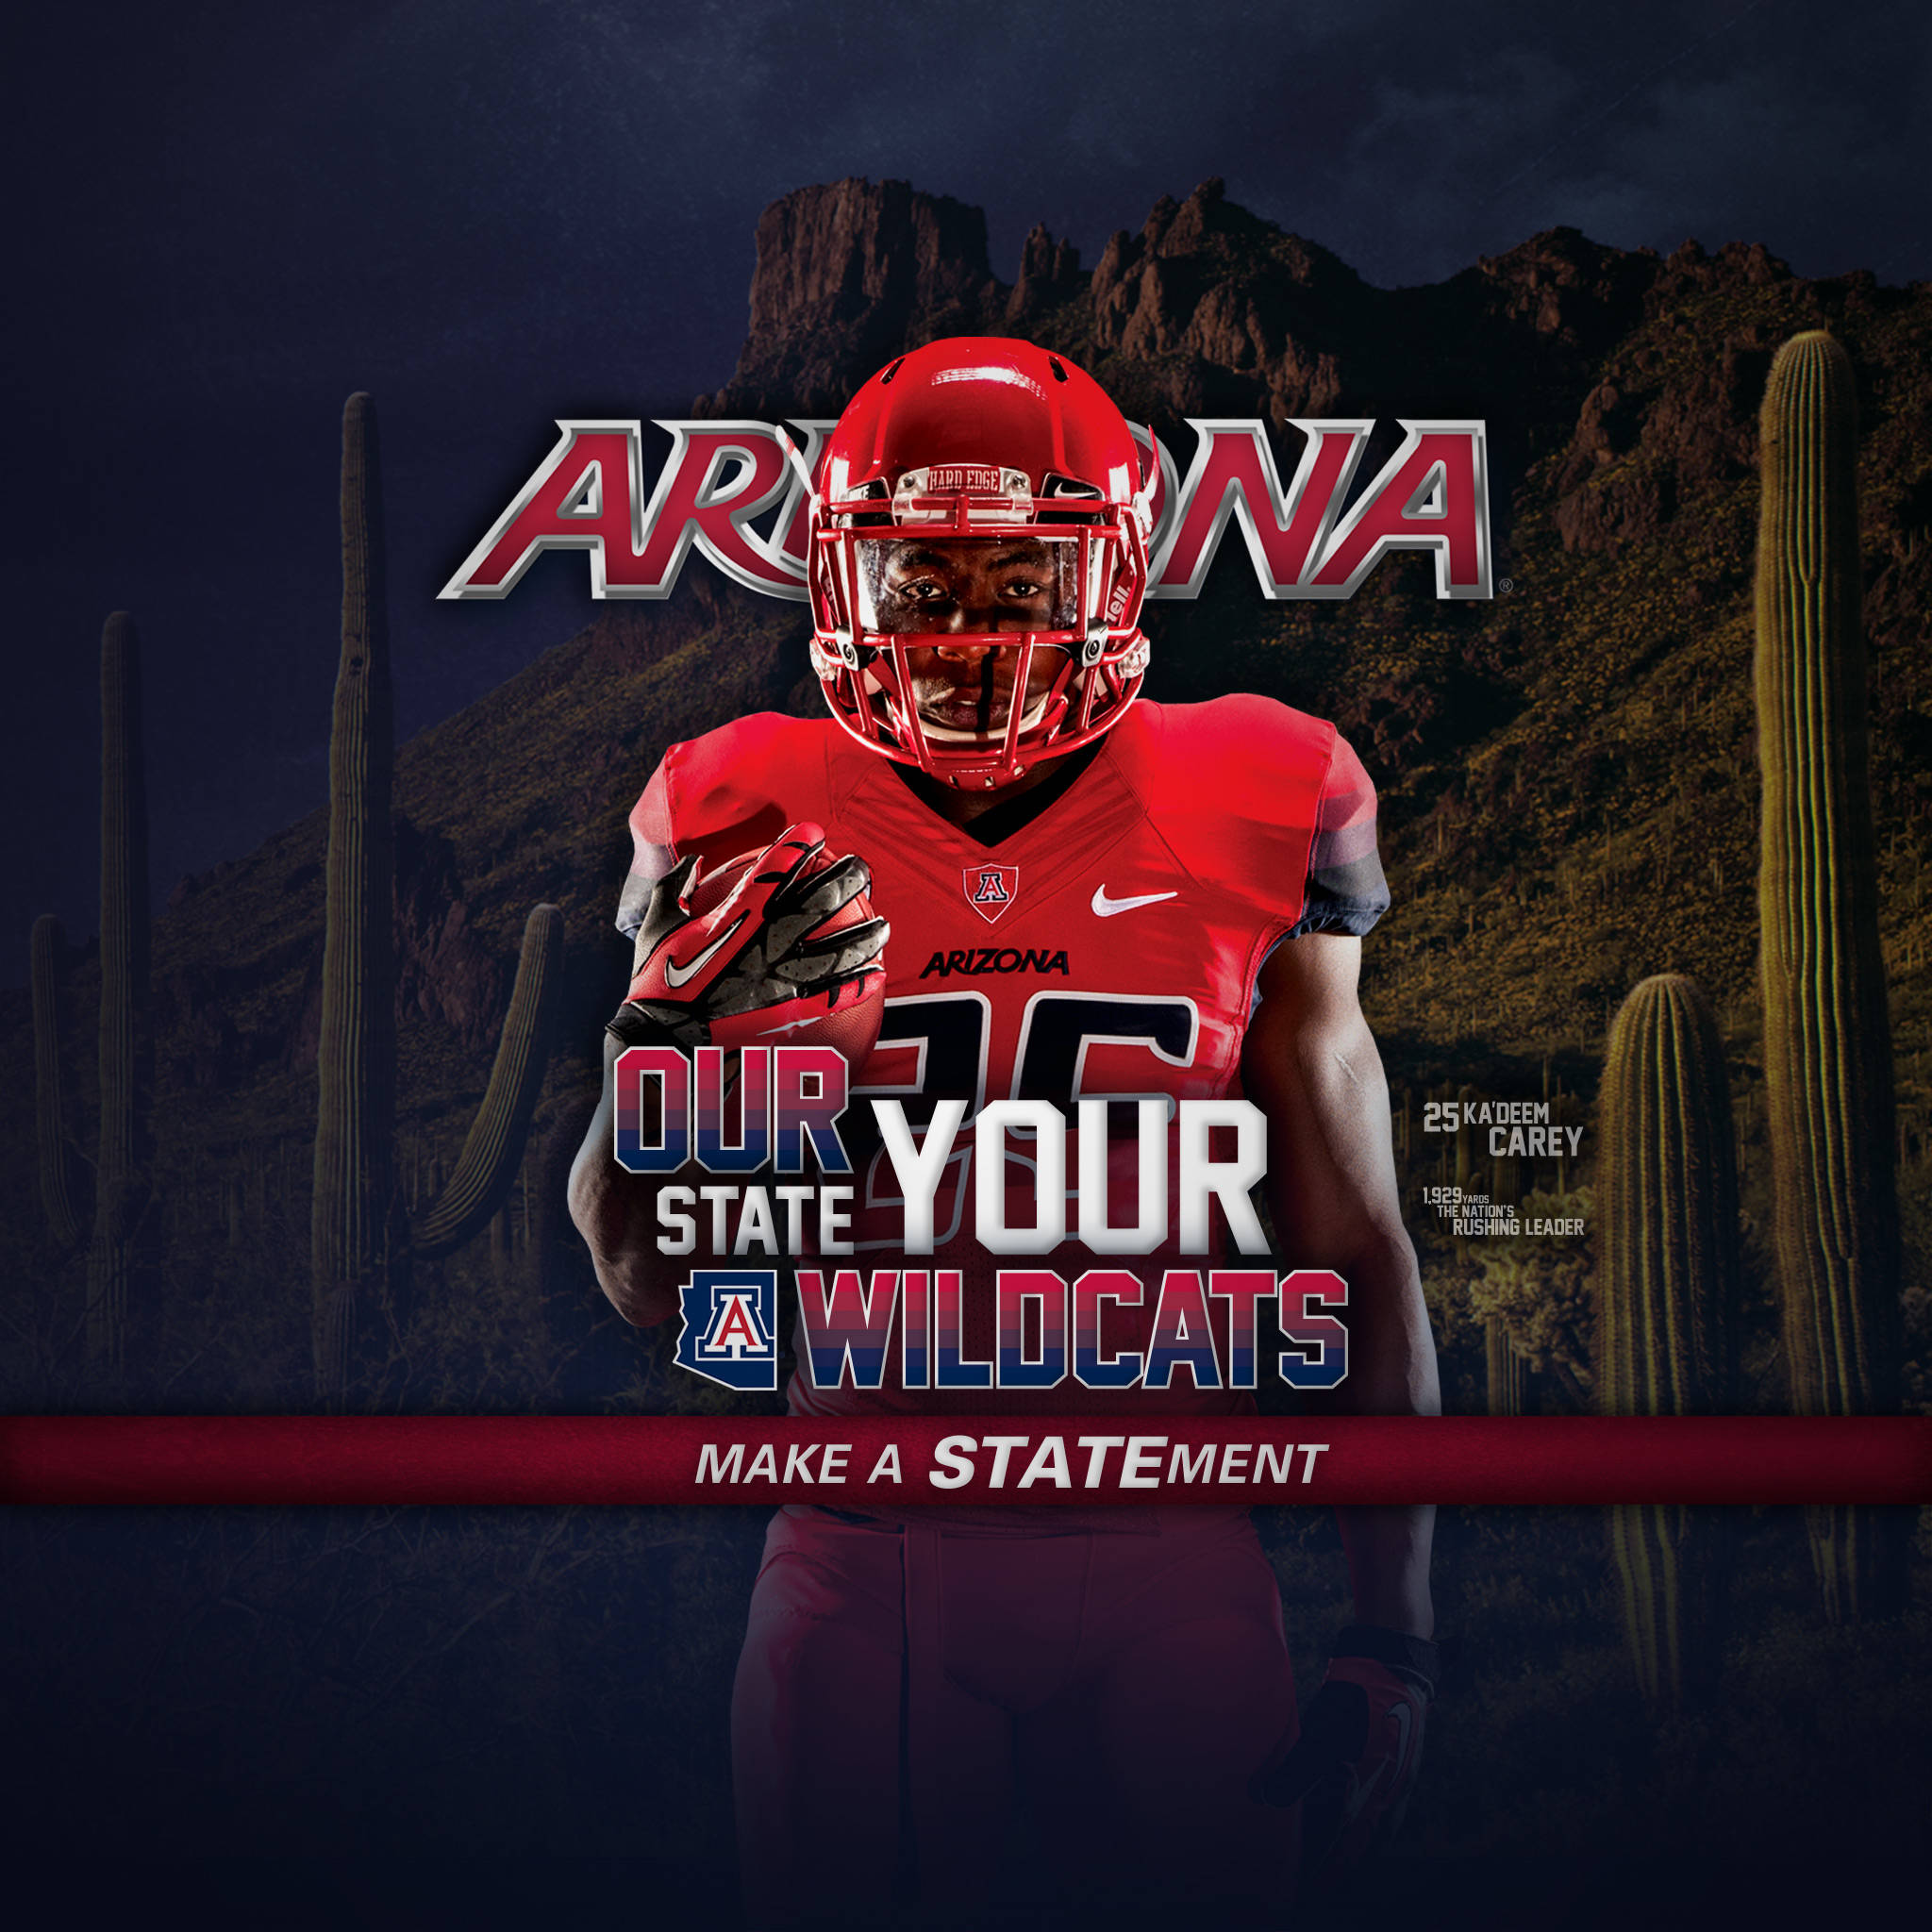 University Of Arizona Computer Wallpaper 2013 arizona football 2048x2048